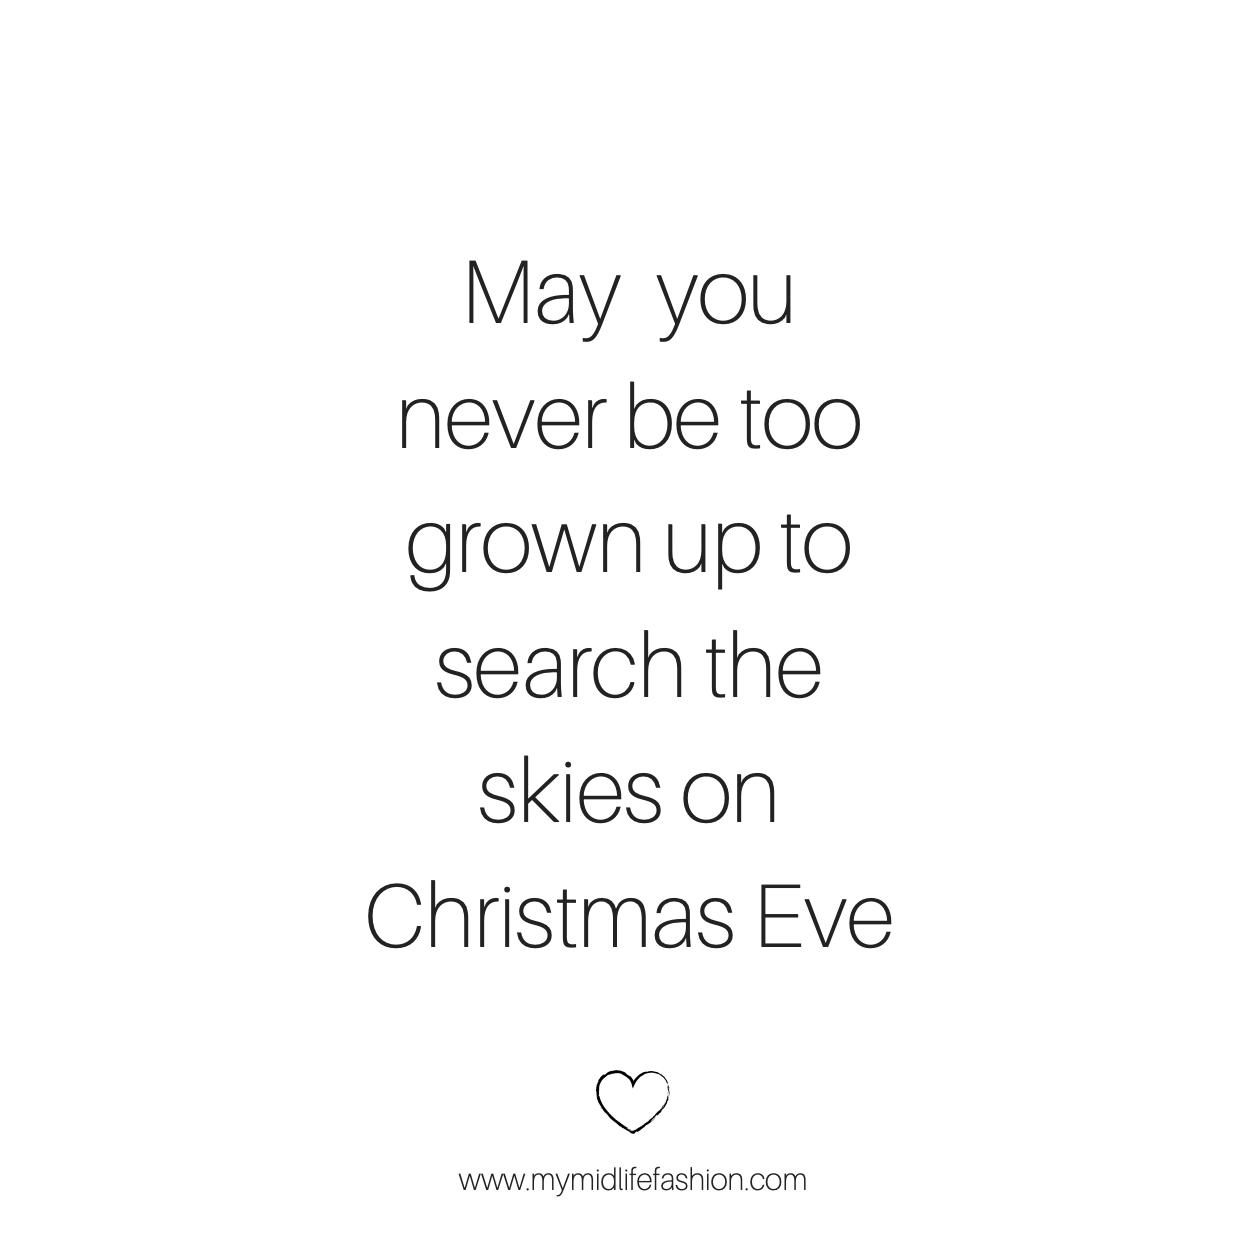 my midlife fashion, Christmas Eve wishes